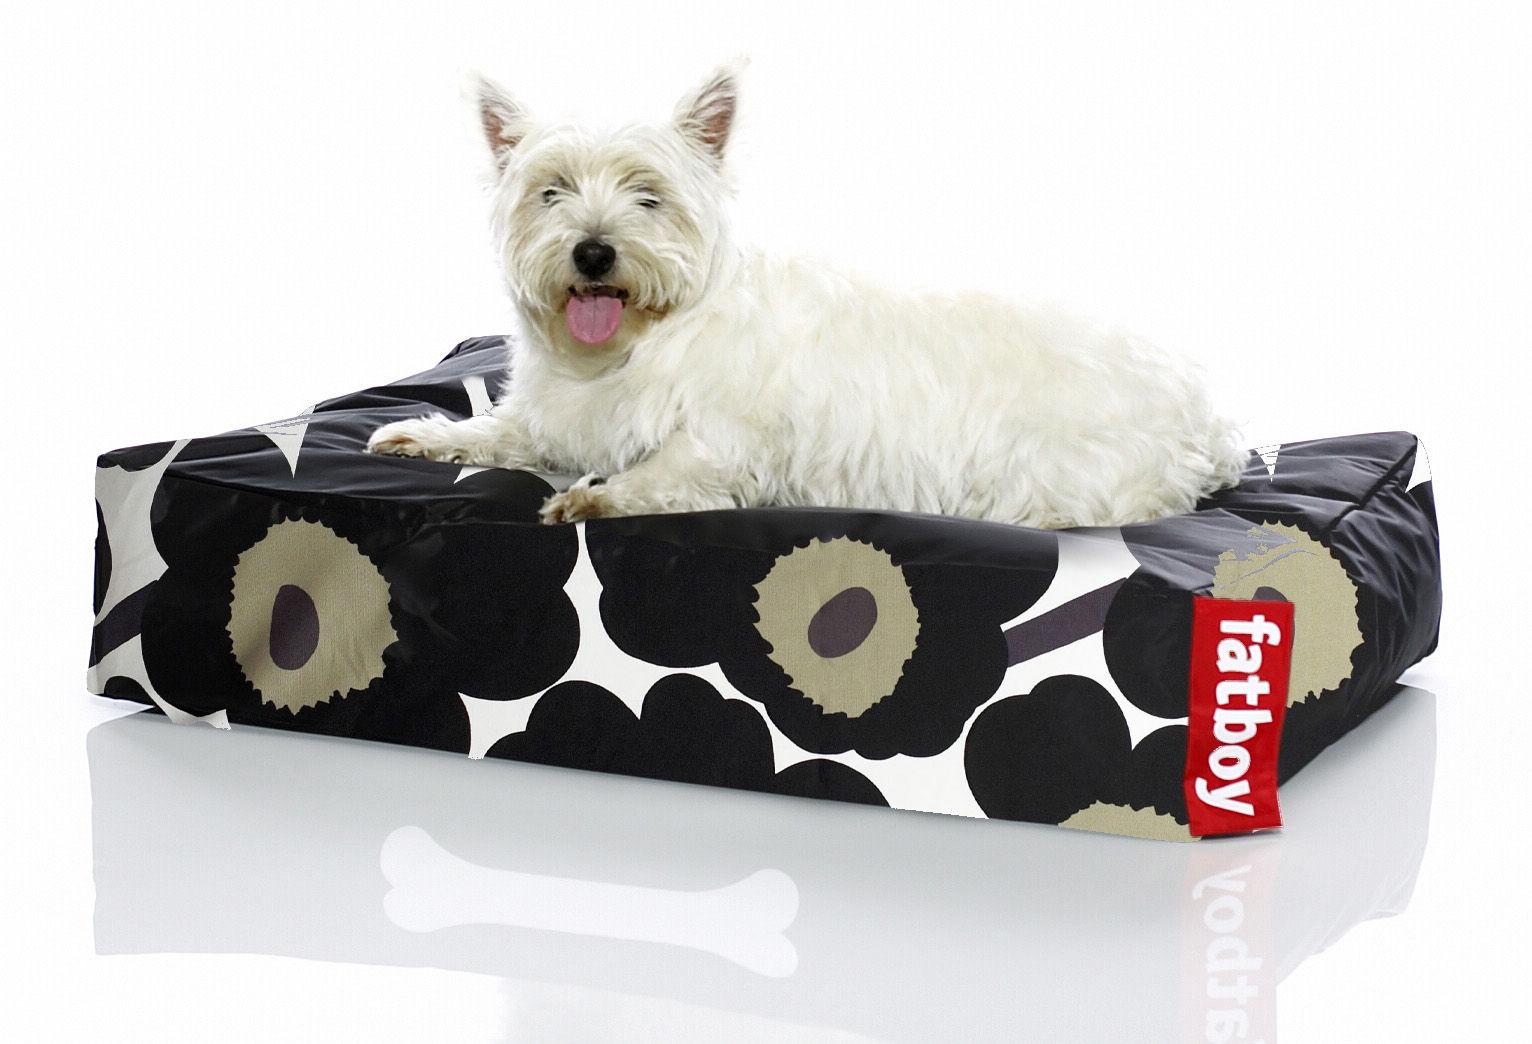 doggielounge small marimekko unikko pouf for dogs unikko black by fatboy. Black Bedroom Furniture Sets. Home Design Ideas